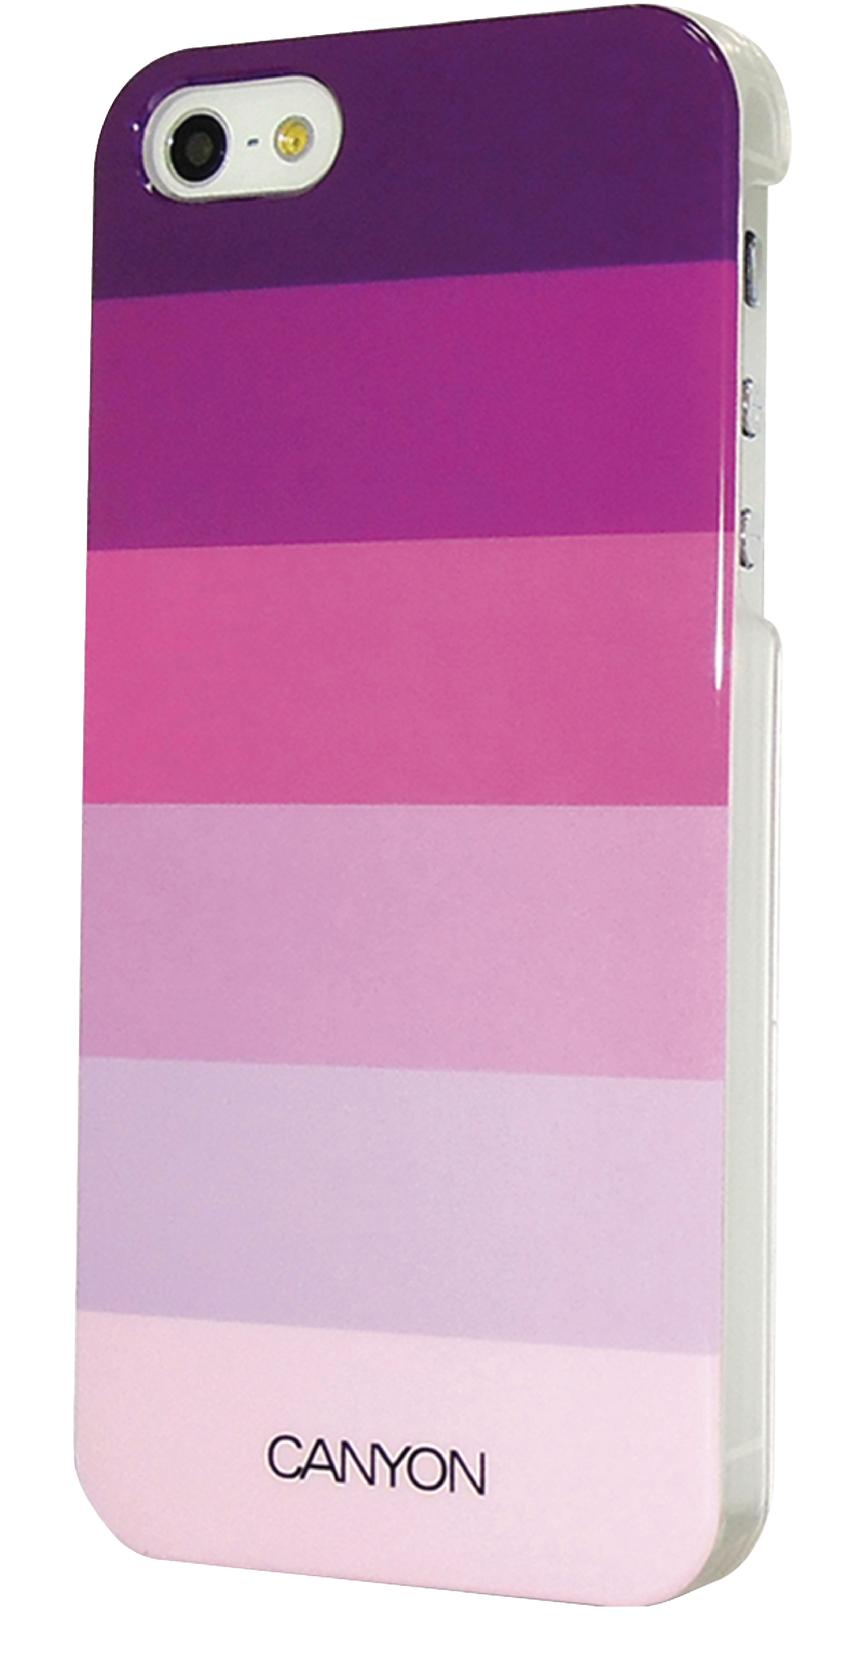 Canyon Cna-i5c02p Iphone 5 Hard Cover Case met Stylus en Screen Protector Paarstinten